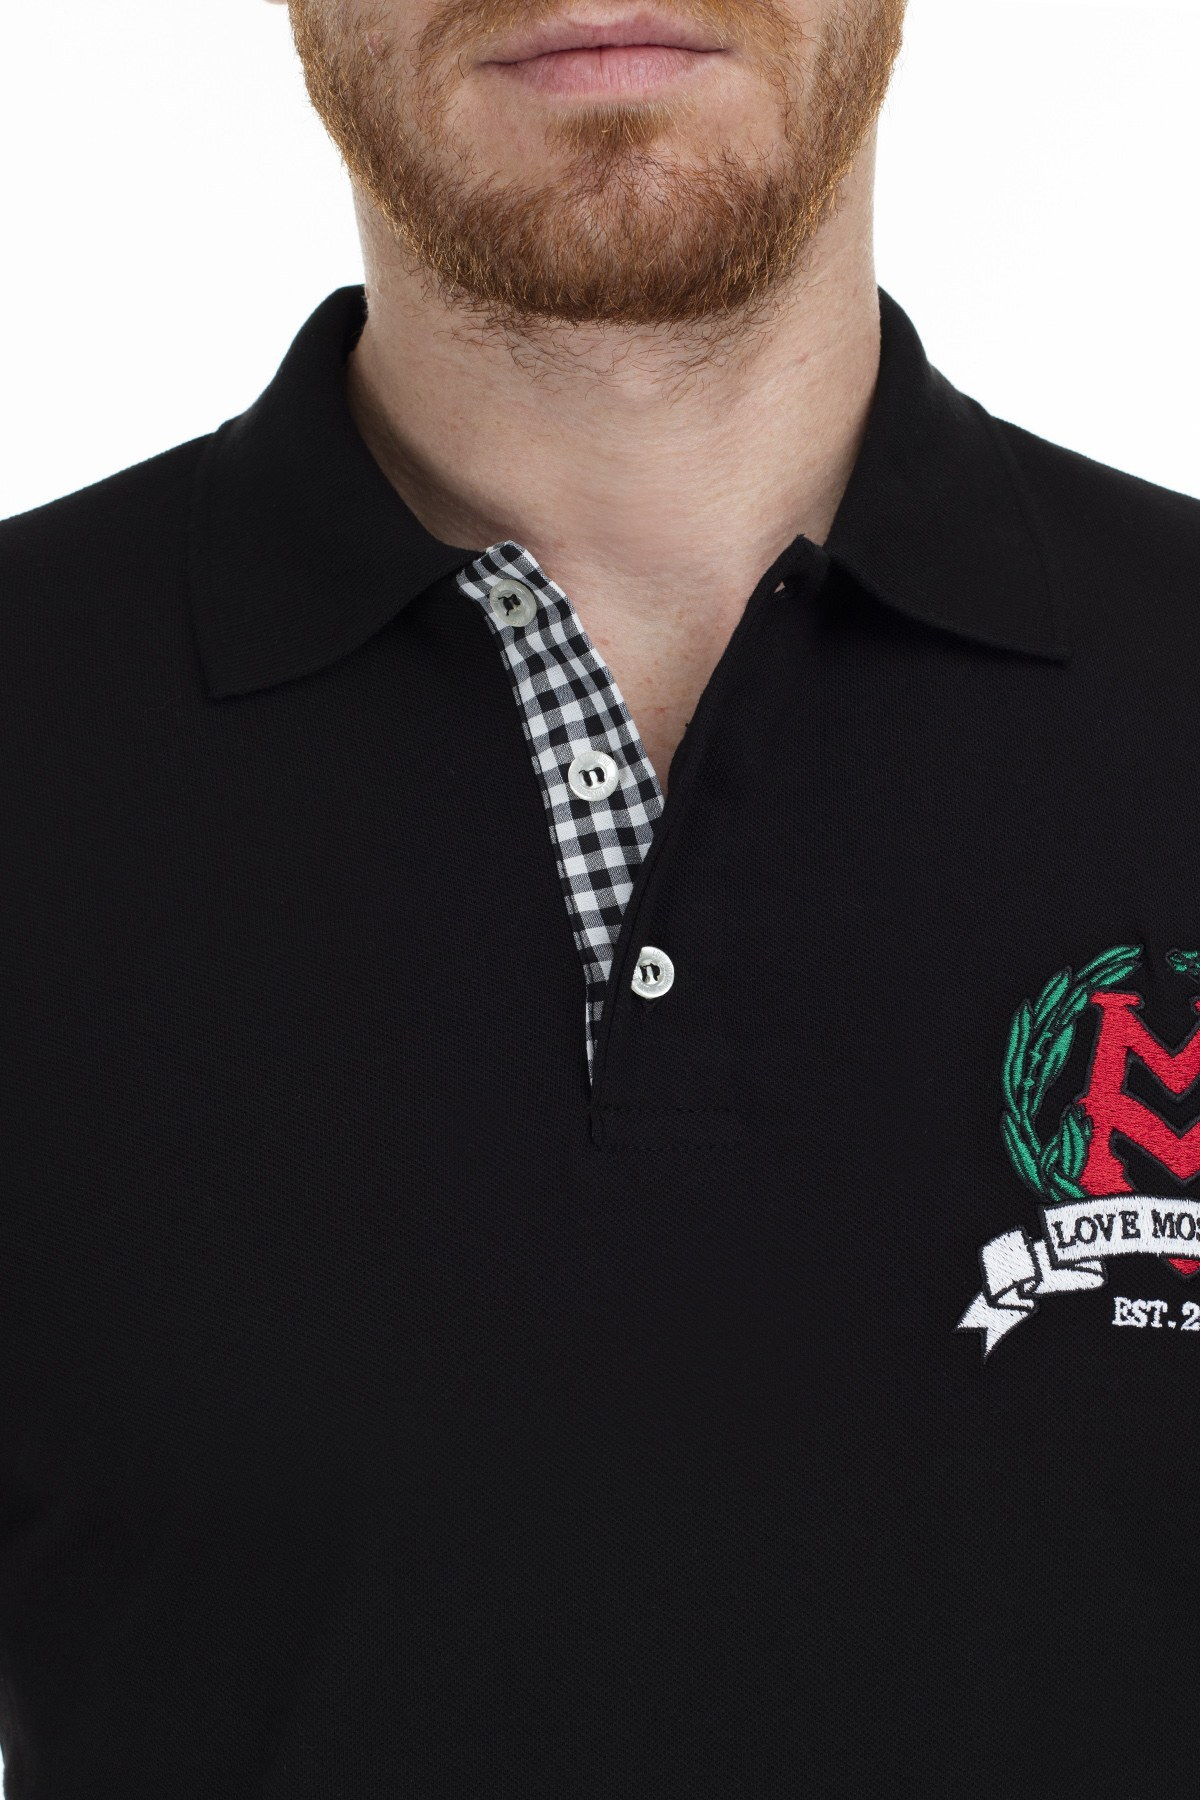 Love Moschino T Shirt Erkek Polo S M831501E1809 C74 SİYAH